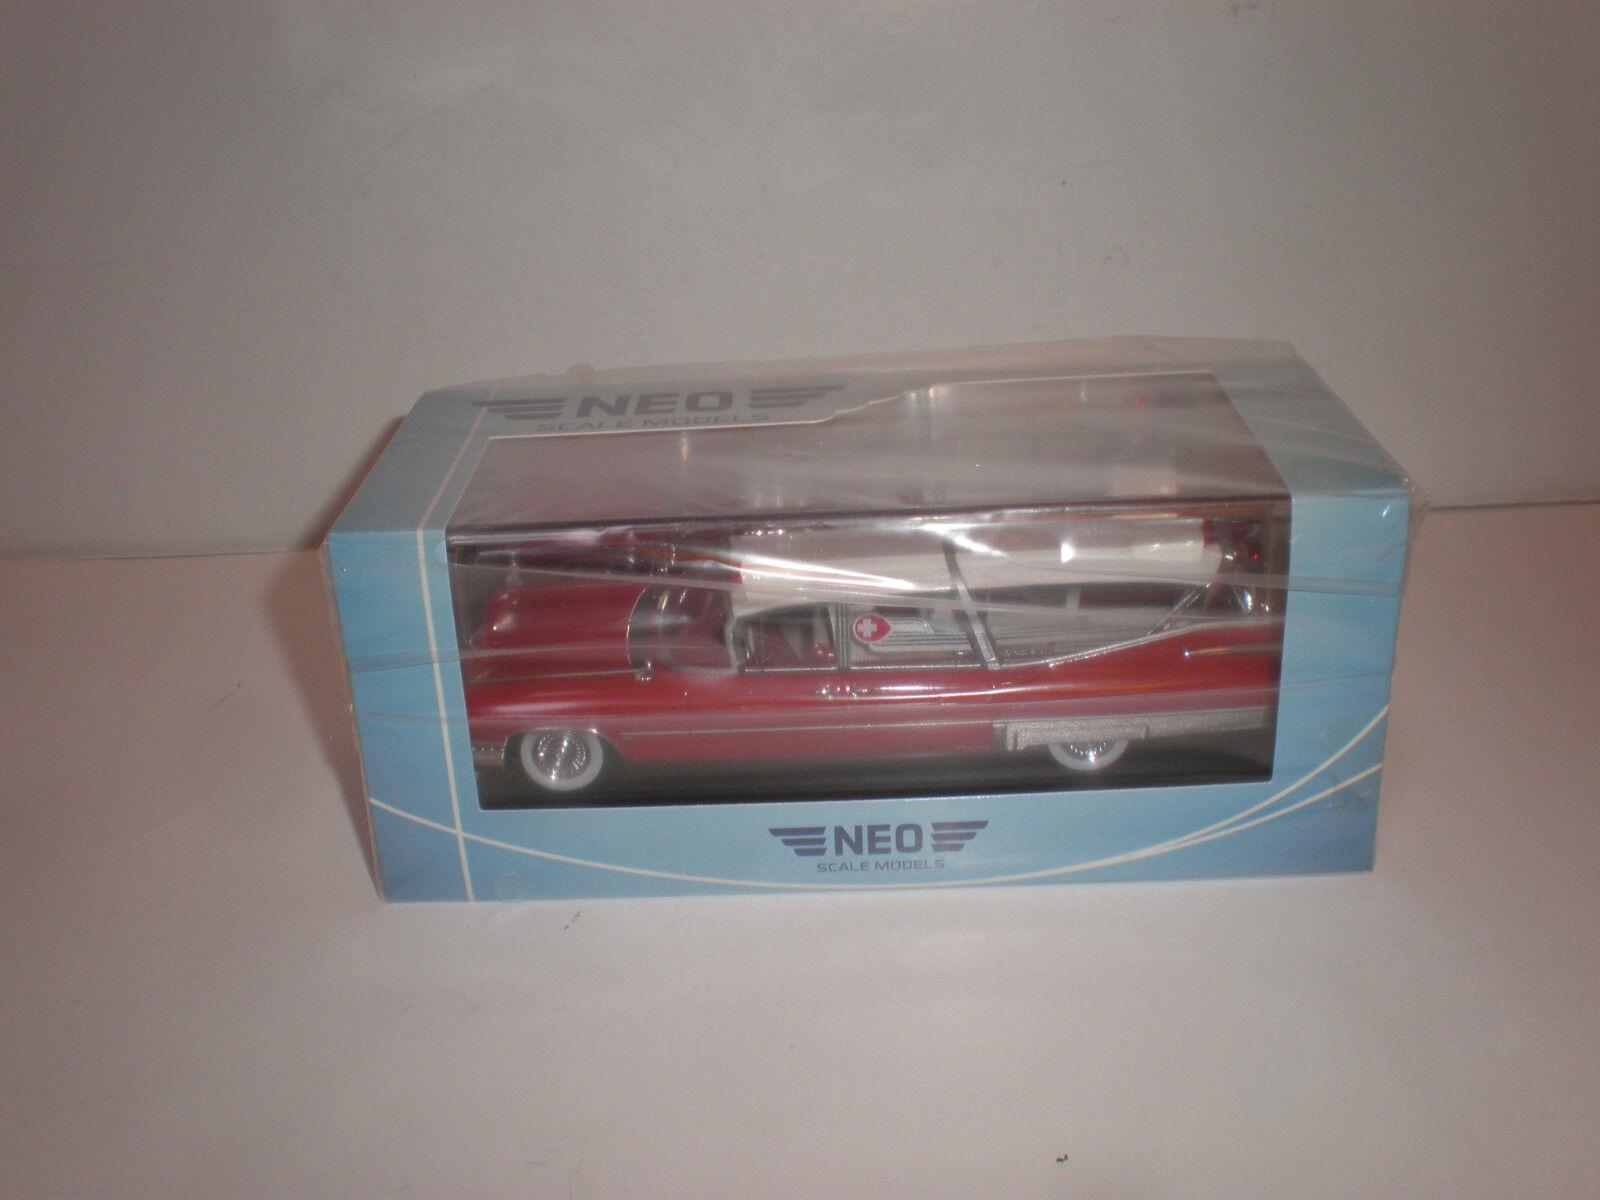 1 43 1959 ILLAC SUPERIOR AMBULANCE Limousine NEO SCALE MODELS